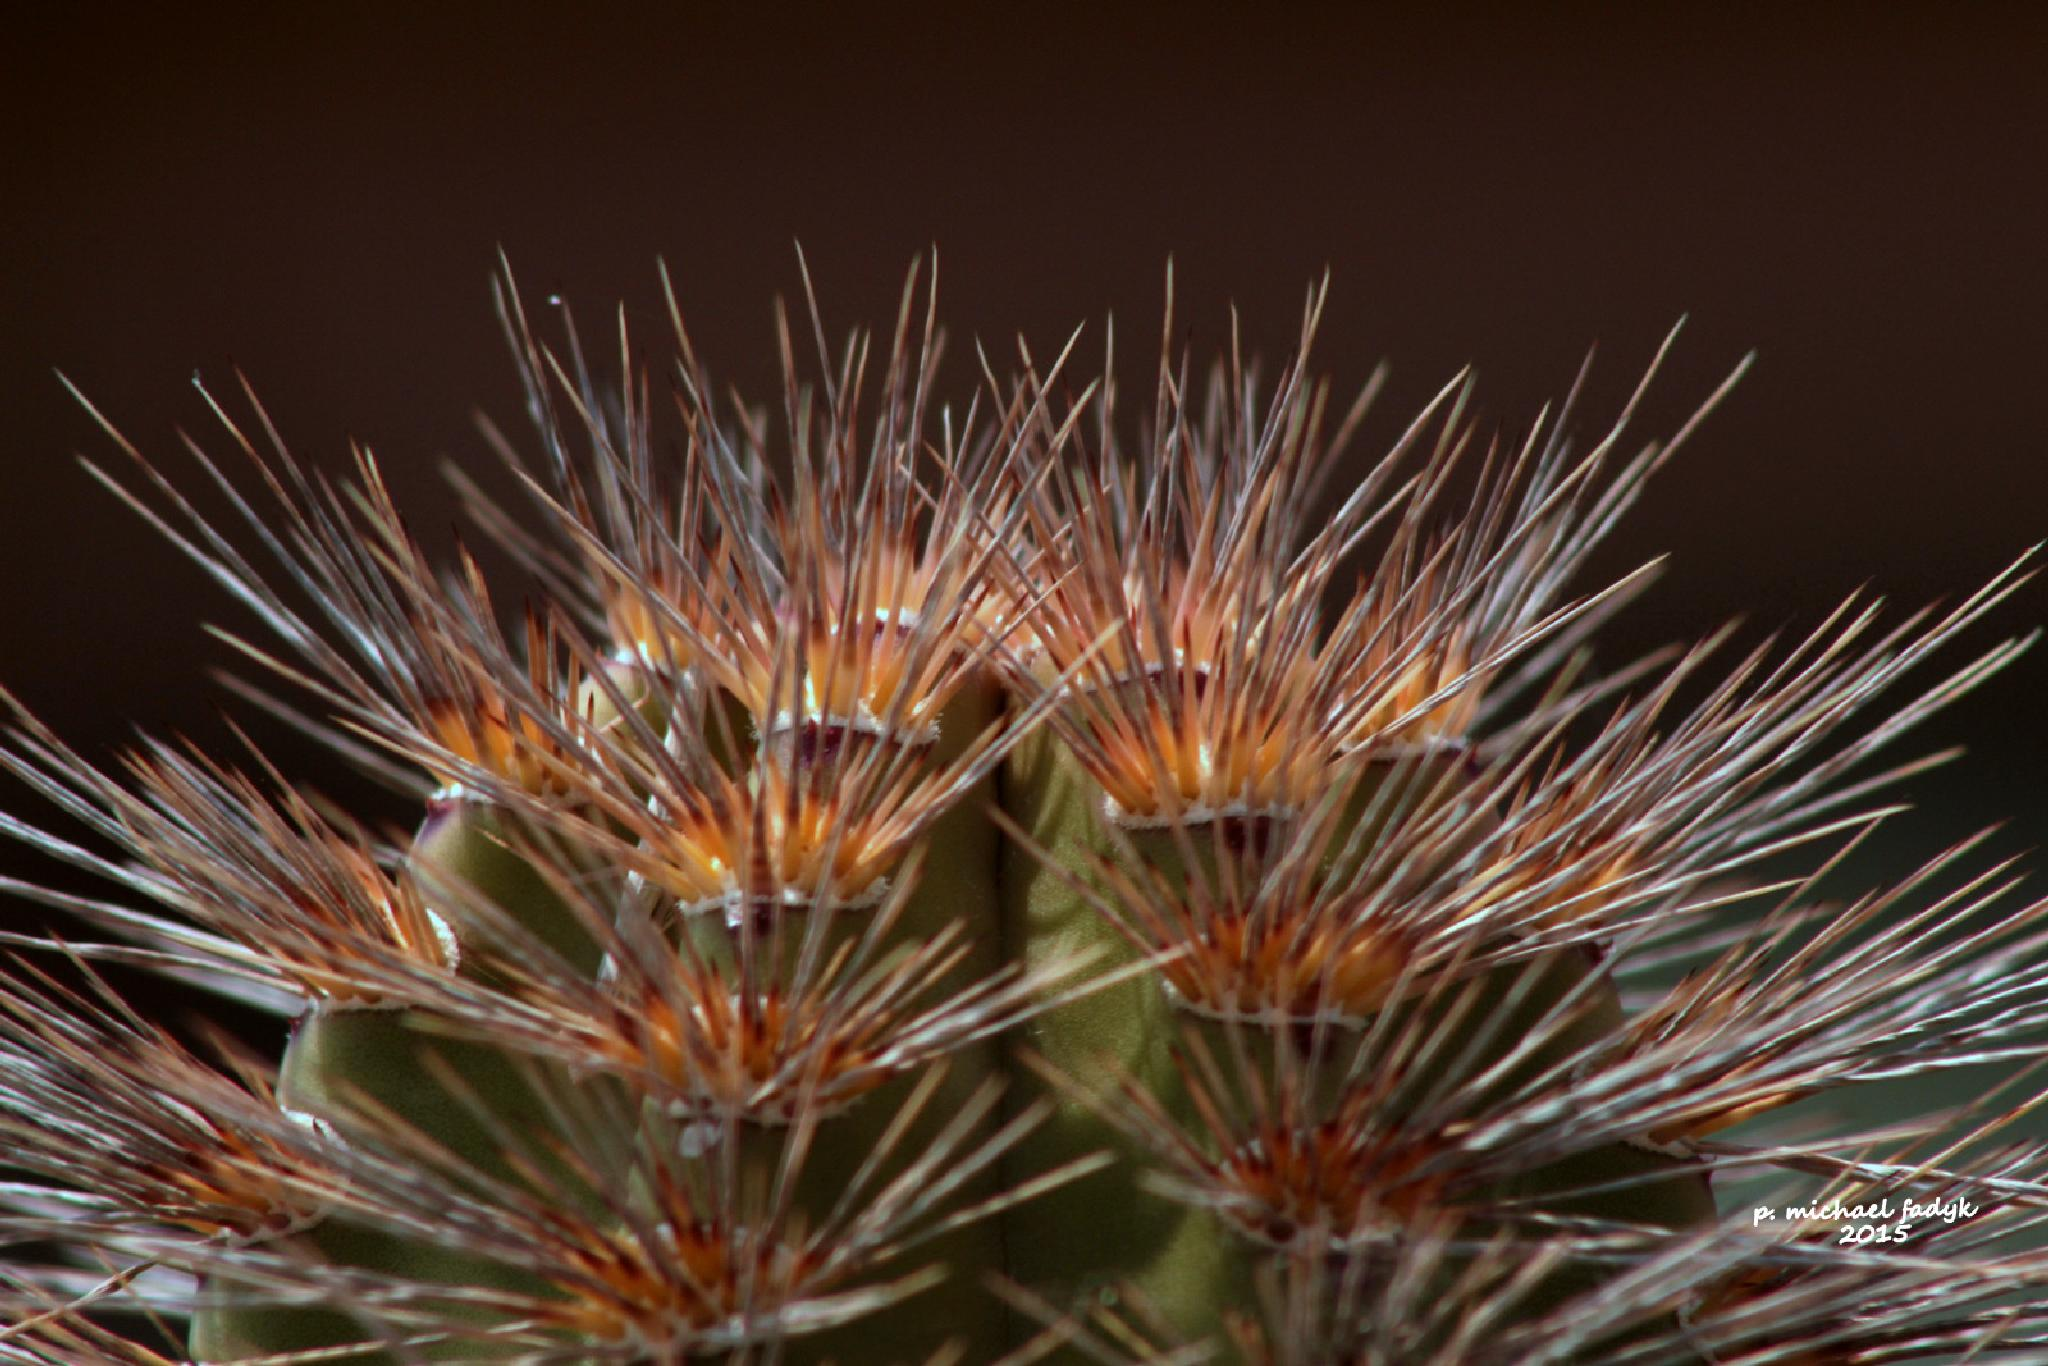 cactus 1 by P. Michael Fadyk